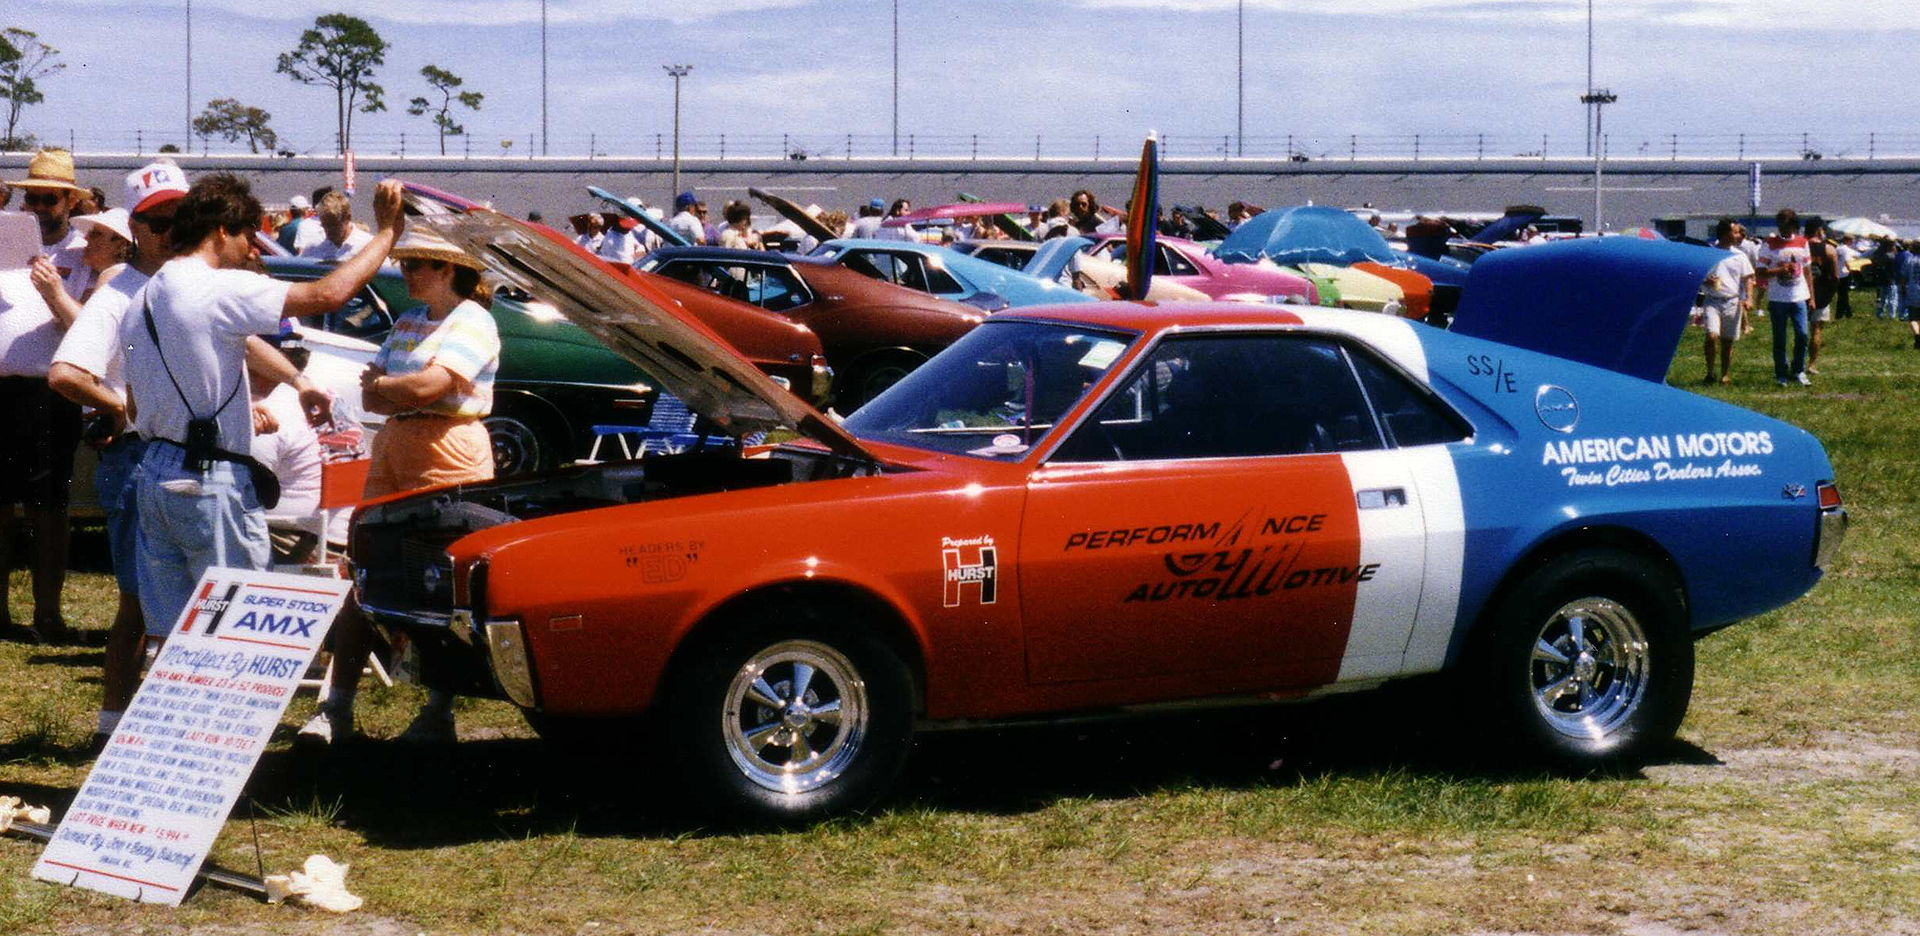 Used Cars Kenosha >> RAMBLER automobile Kenosha Wisconsin USA Part III – Myn Transport Blog